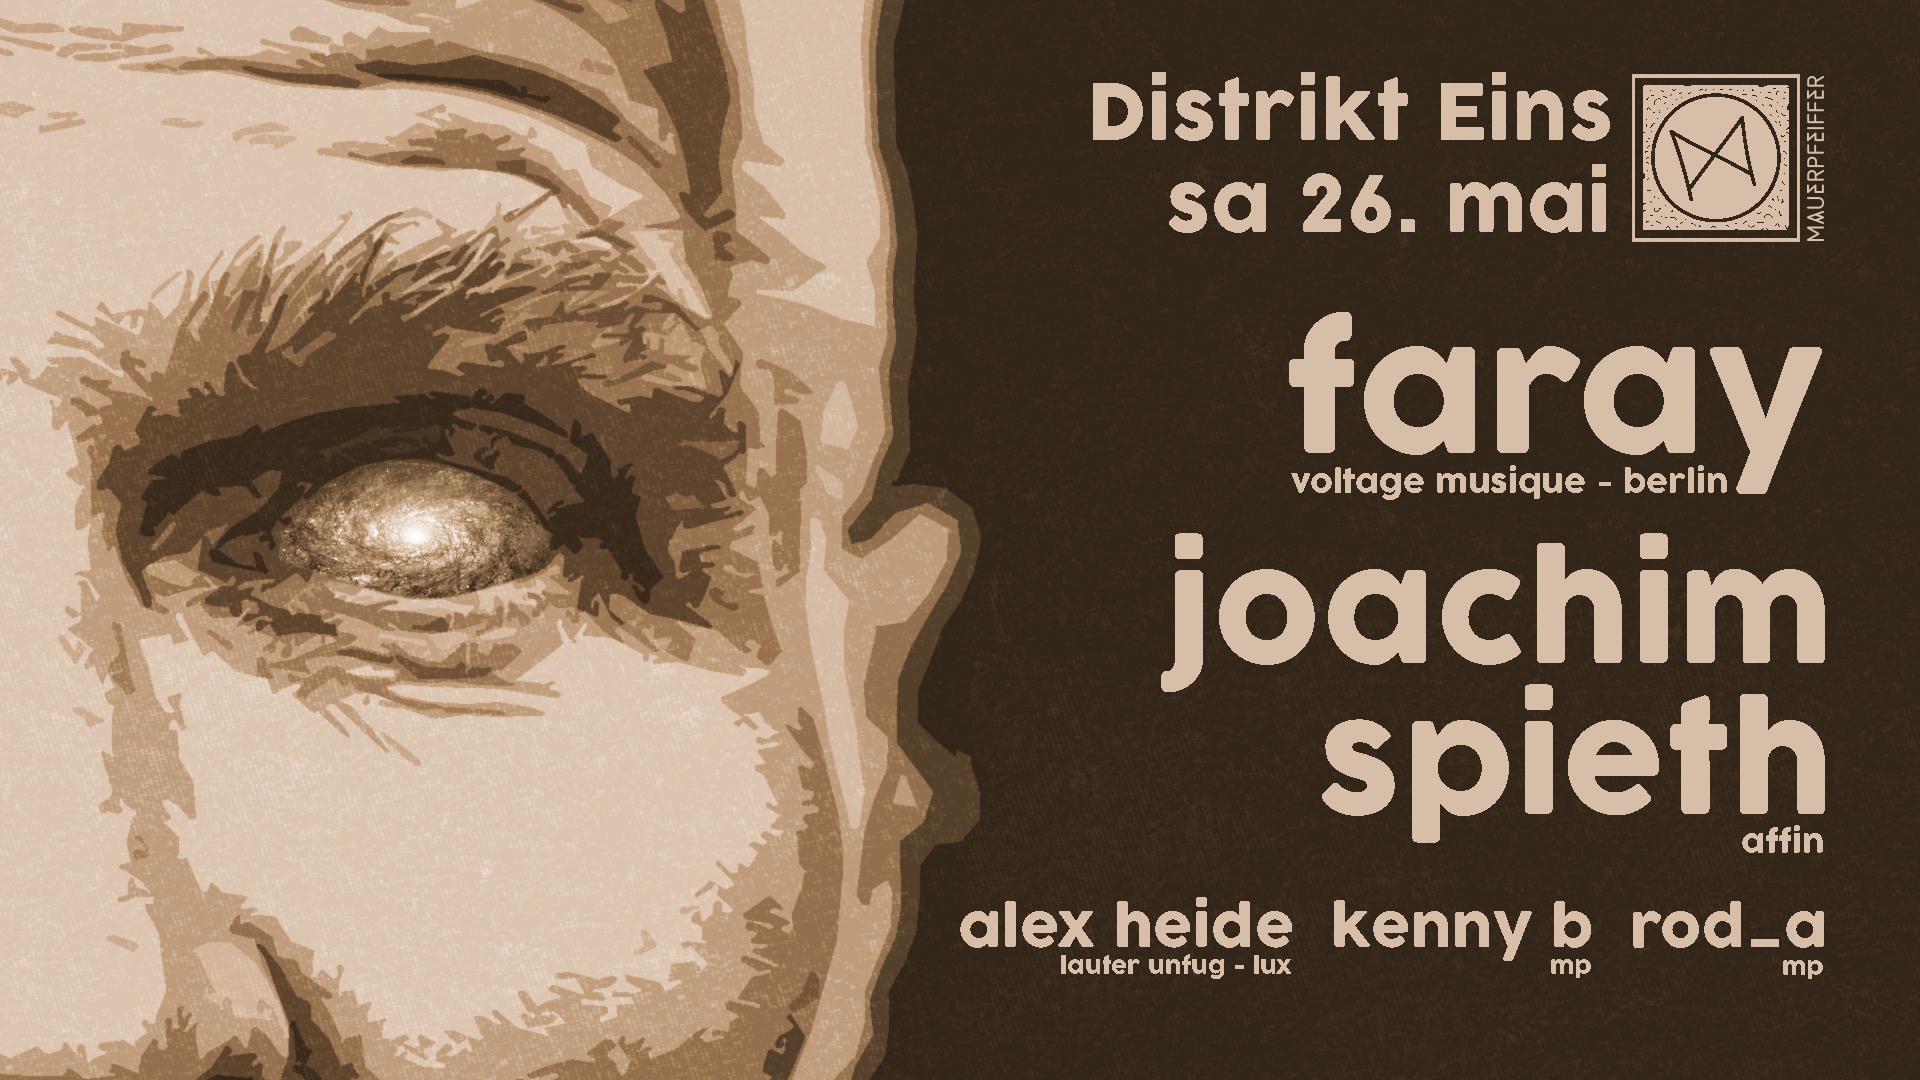 Distrikt Eins w/ Faray & Joachim Spieth